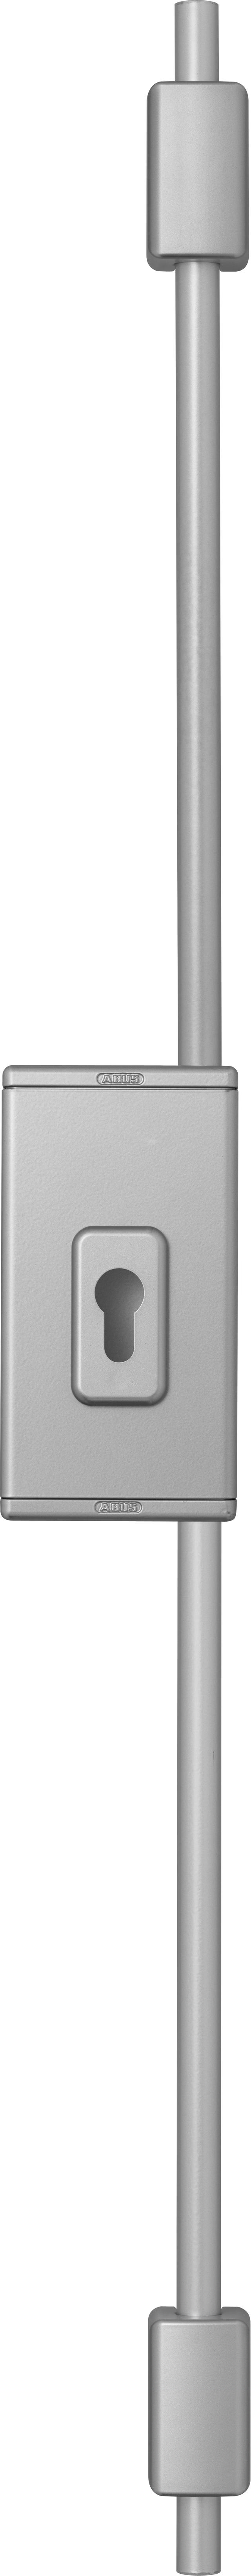 Tür-Stangenschloss TSS550 S ohne Zylinder